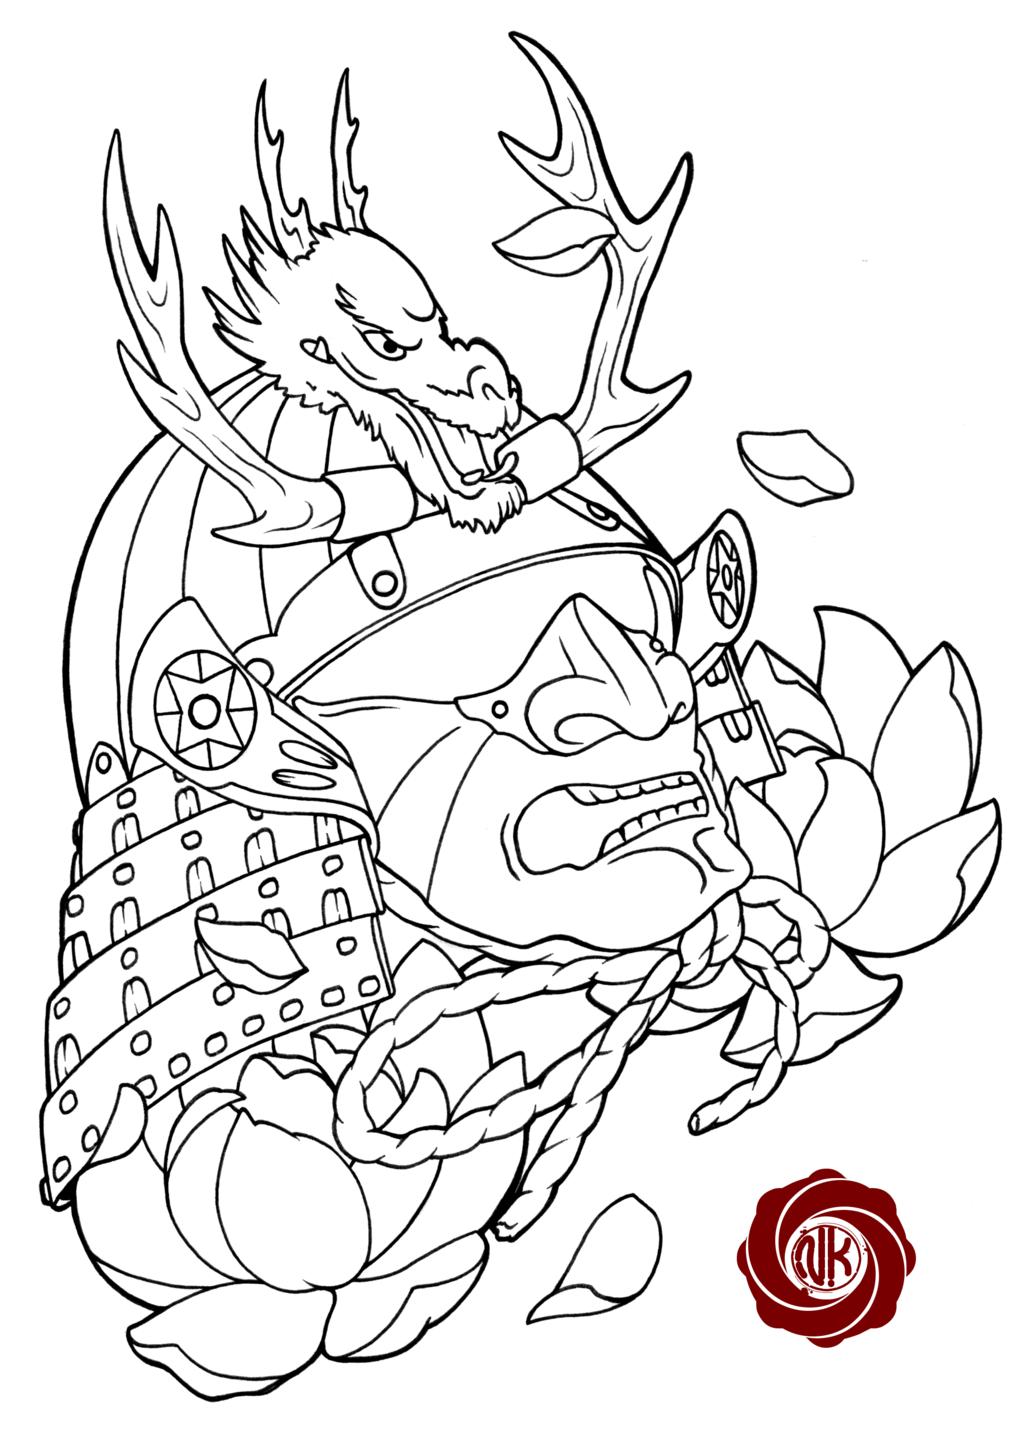 Drawn samurai knee Warrior Deviantart Pinterest Dragon Google